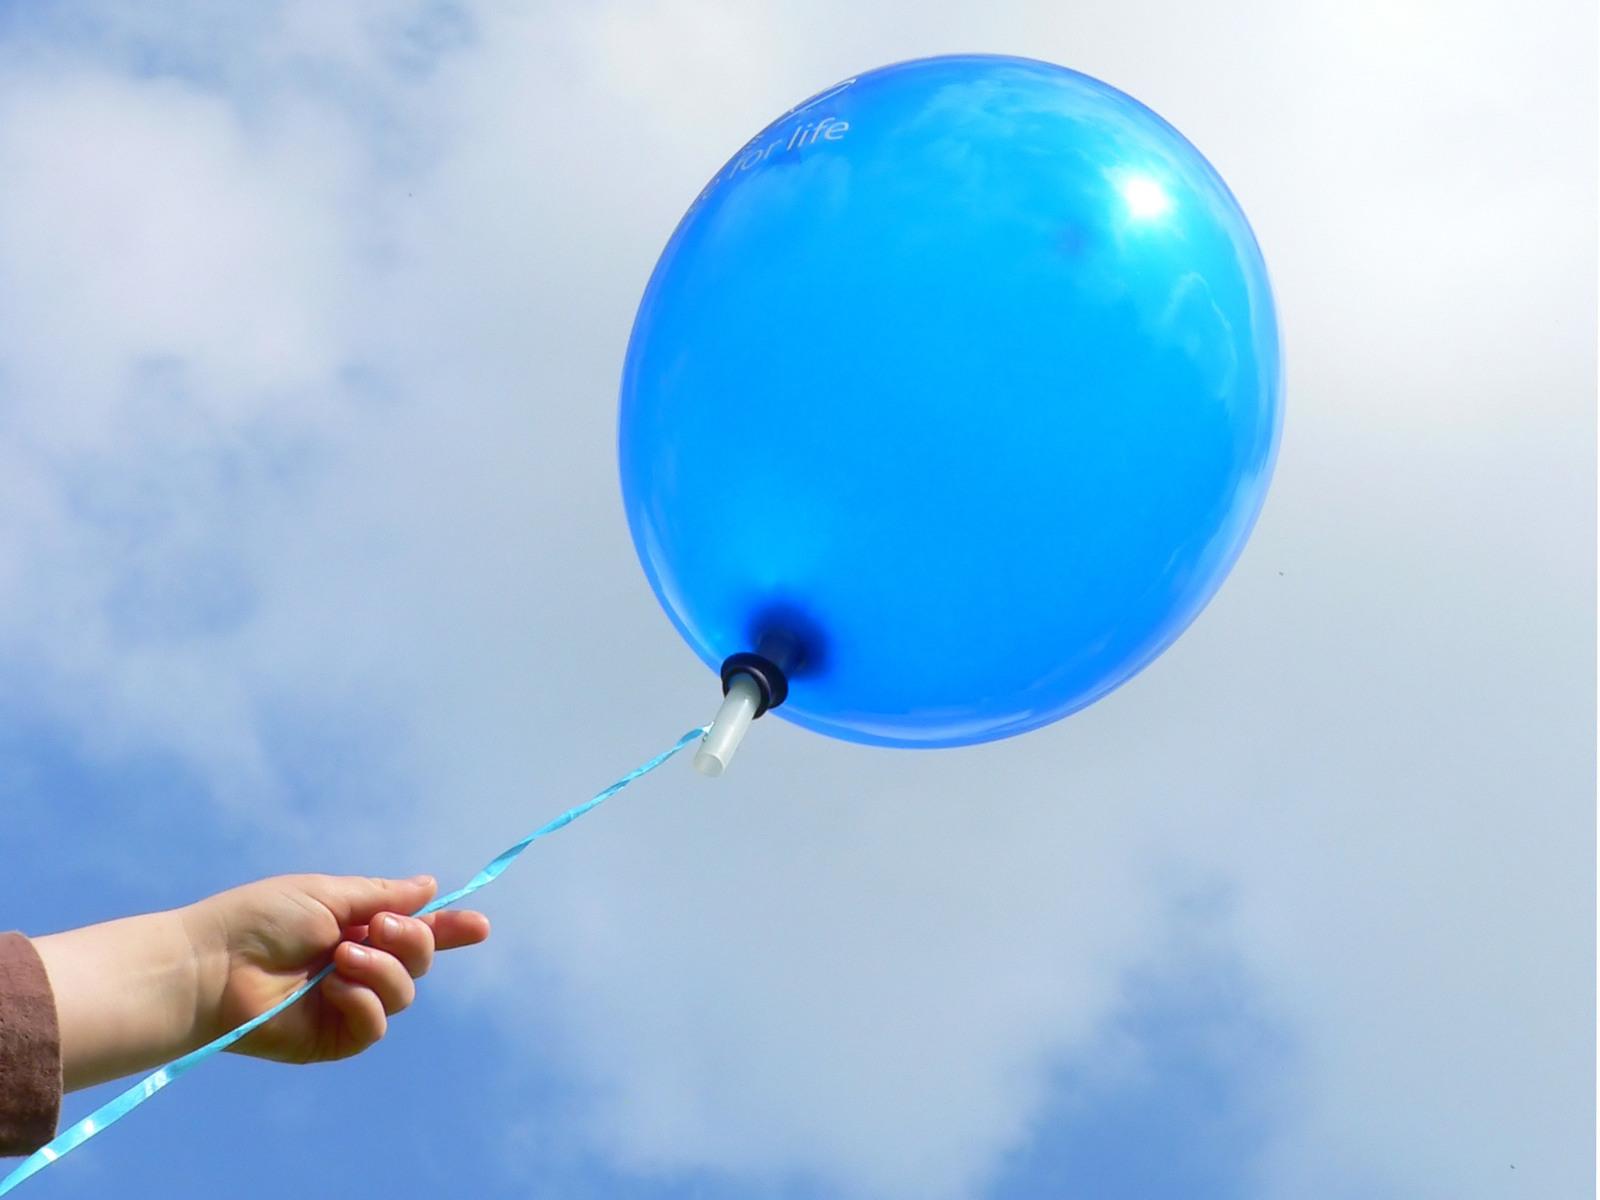 blue-balloon-1193182-1600x1200